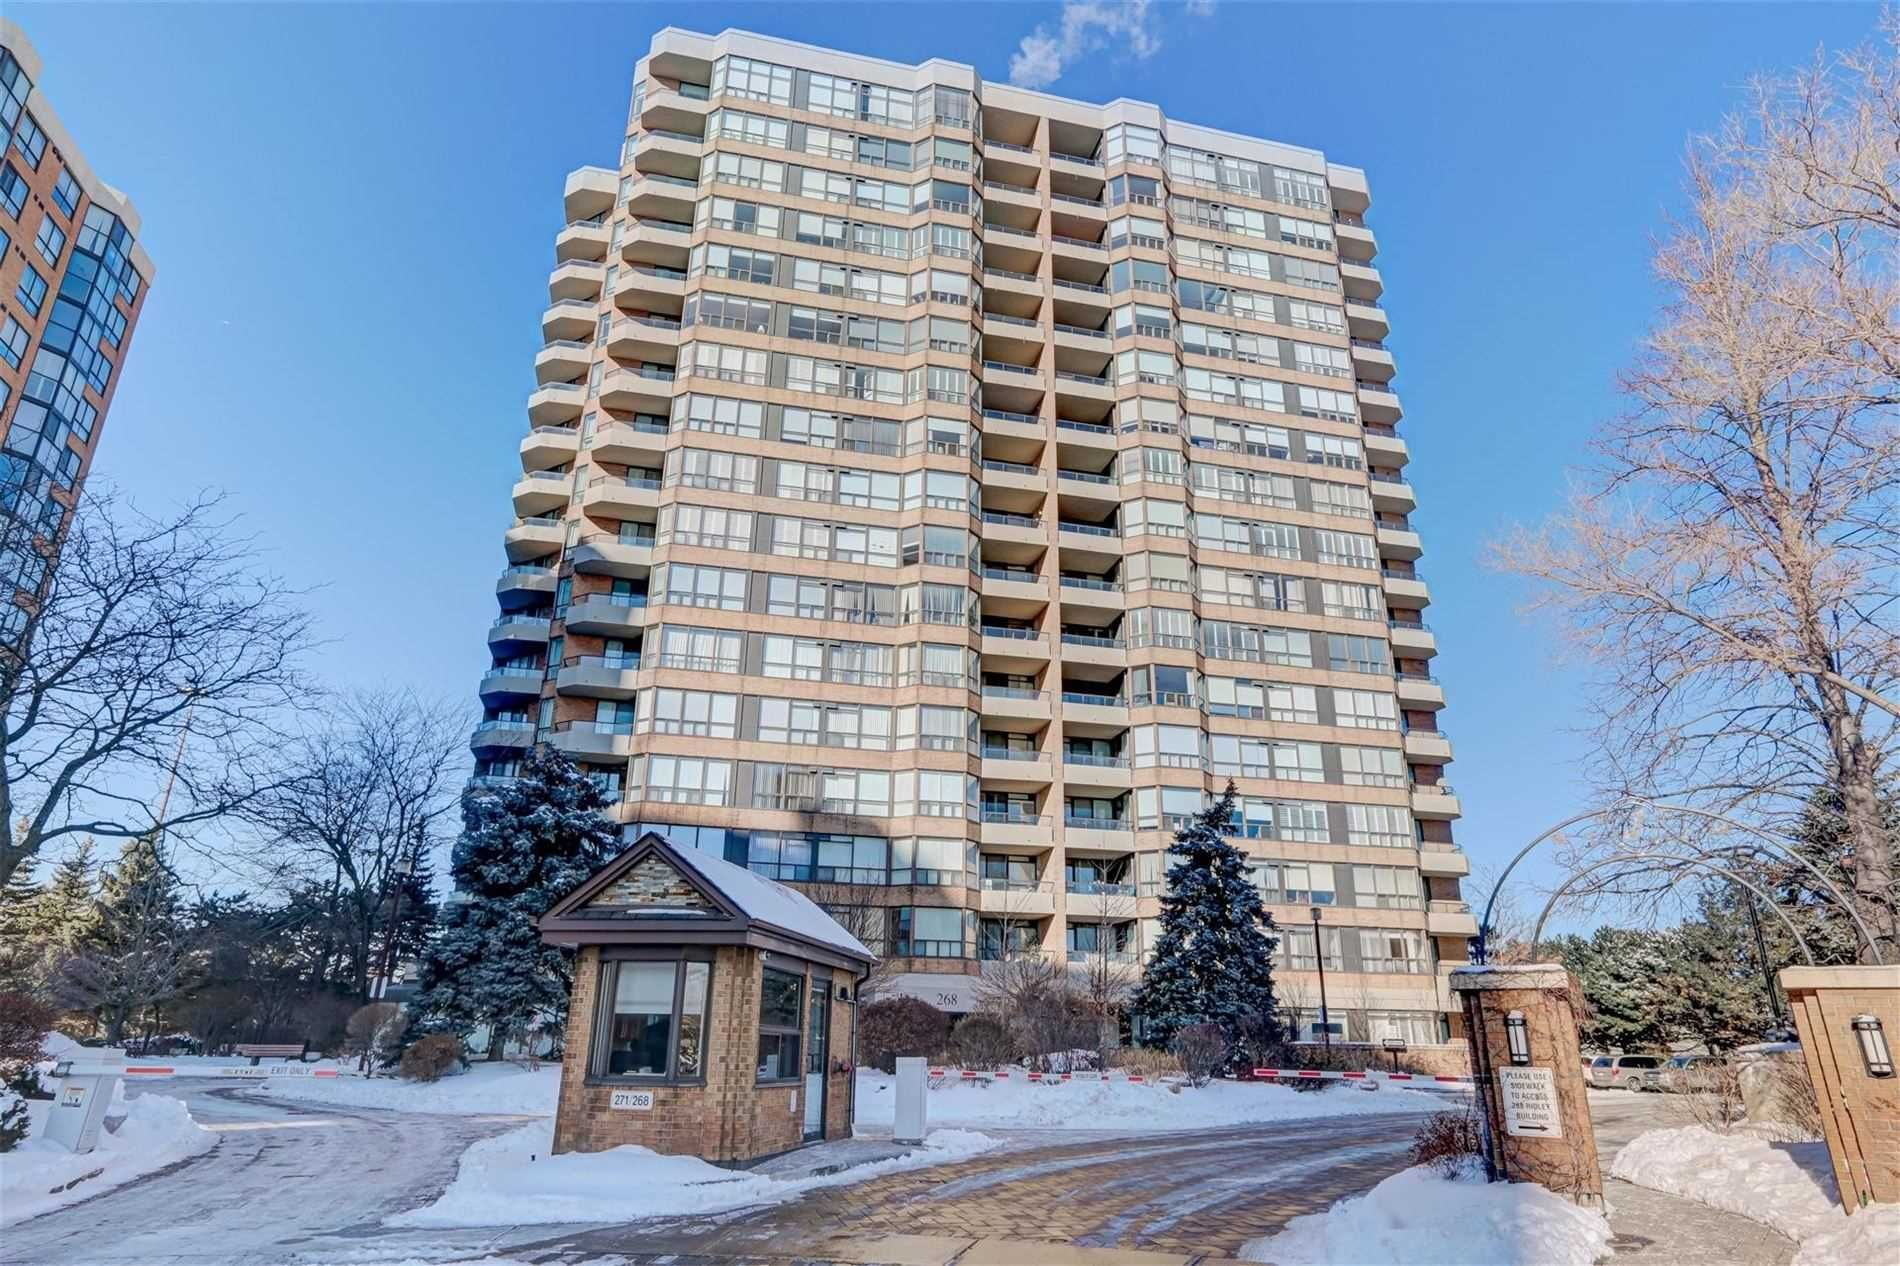 Main Photo: 912 268 Ridley Boulevard in Toronto: Bedford Park-Nortown Condo for sale (Toronto C04)  : MLS®# C4674412